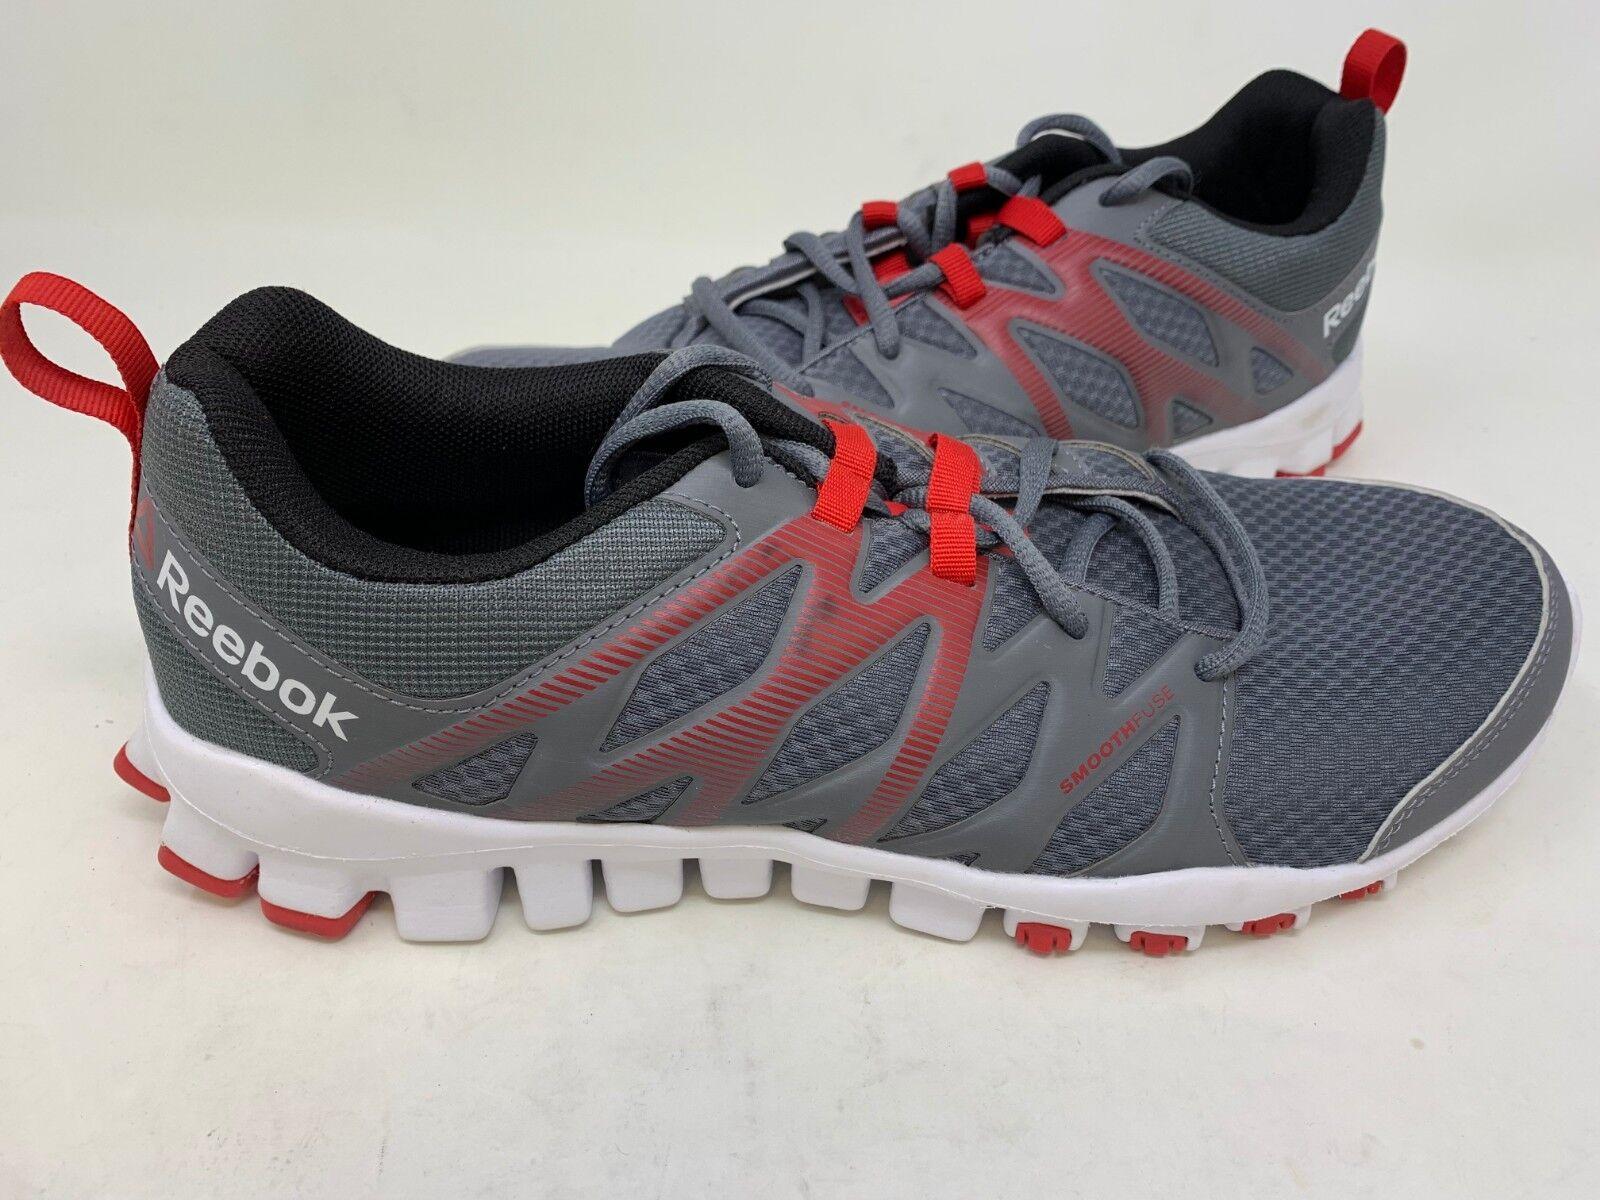 NEW  Reebok Men's Realflex Training 4.0 shoes Grey Red  AR3572 140R tz